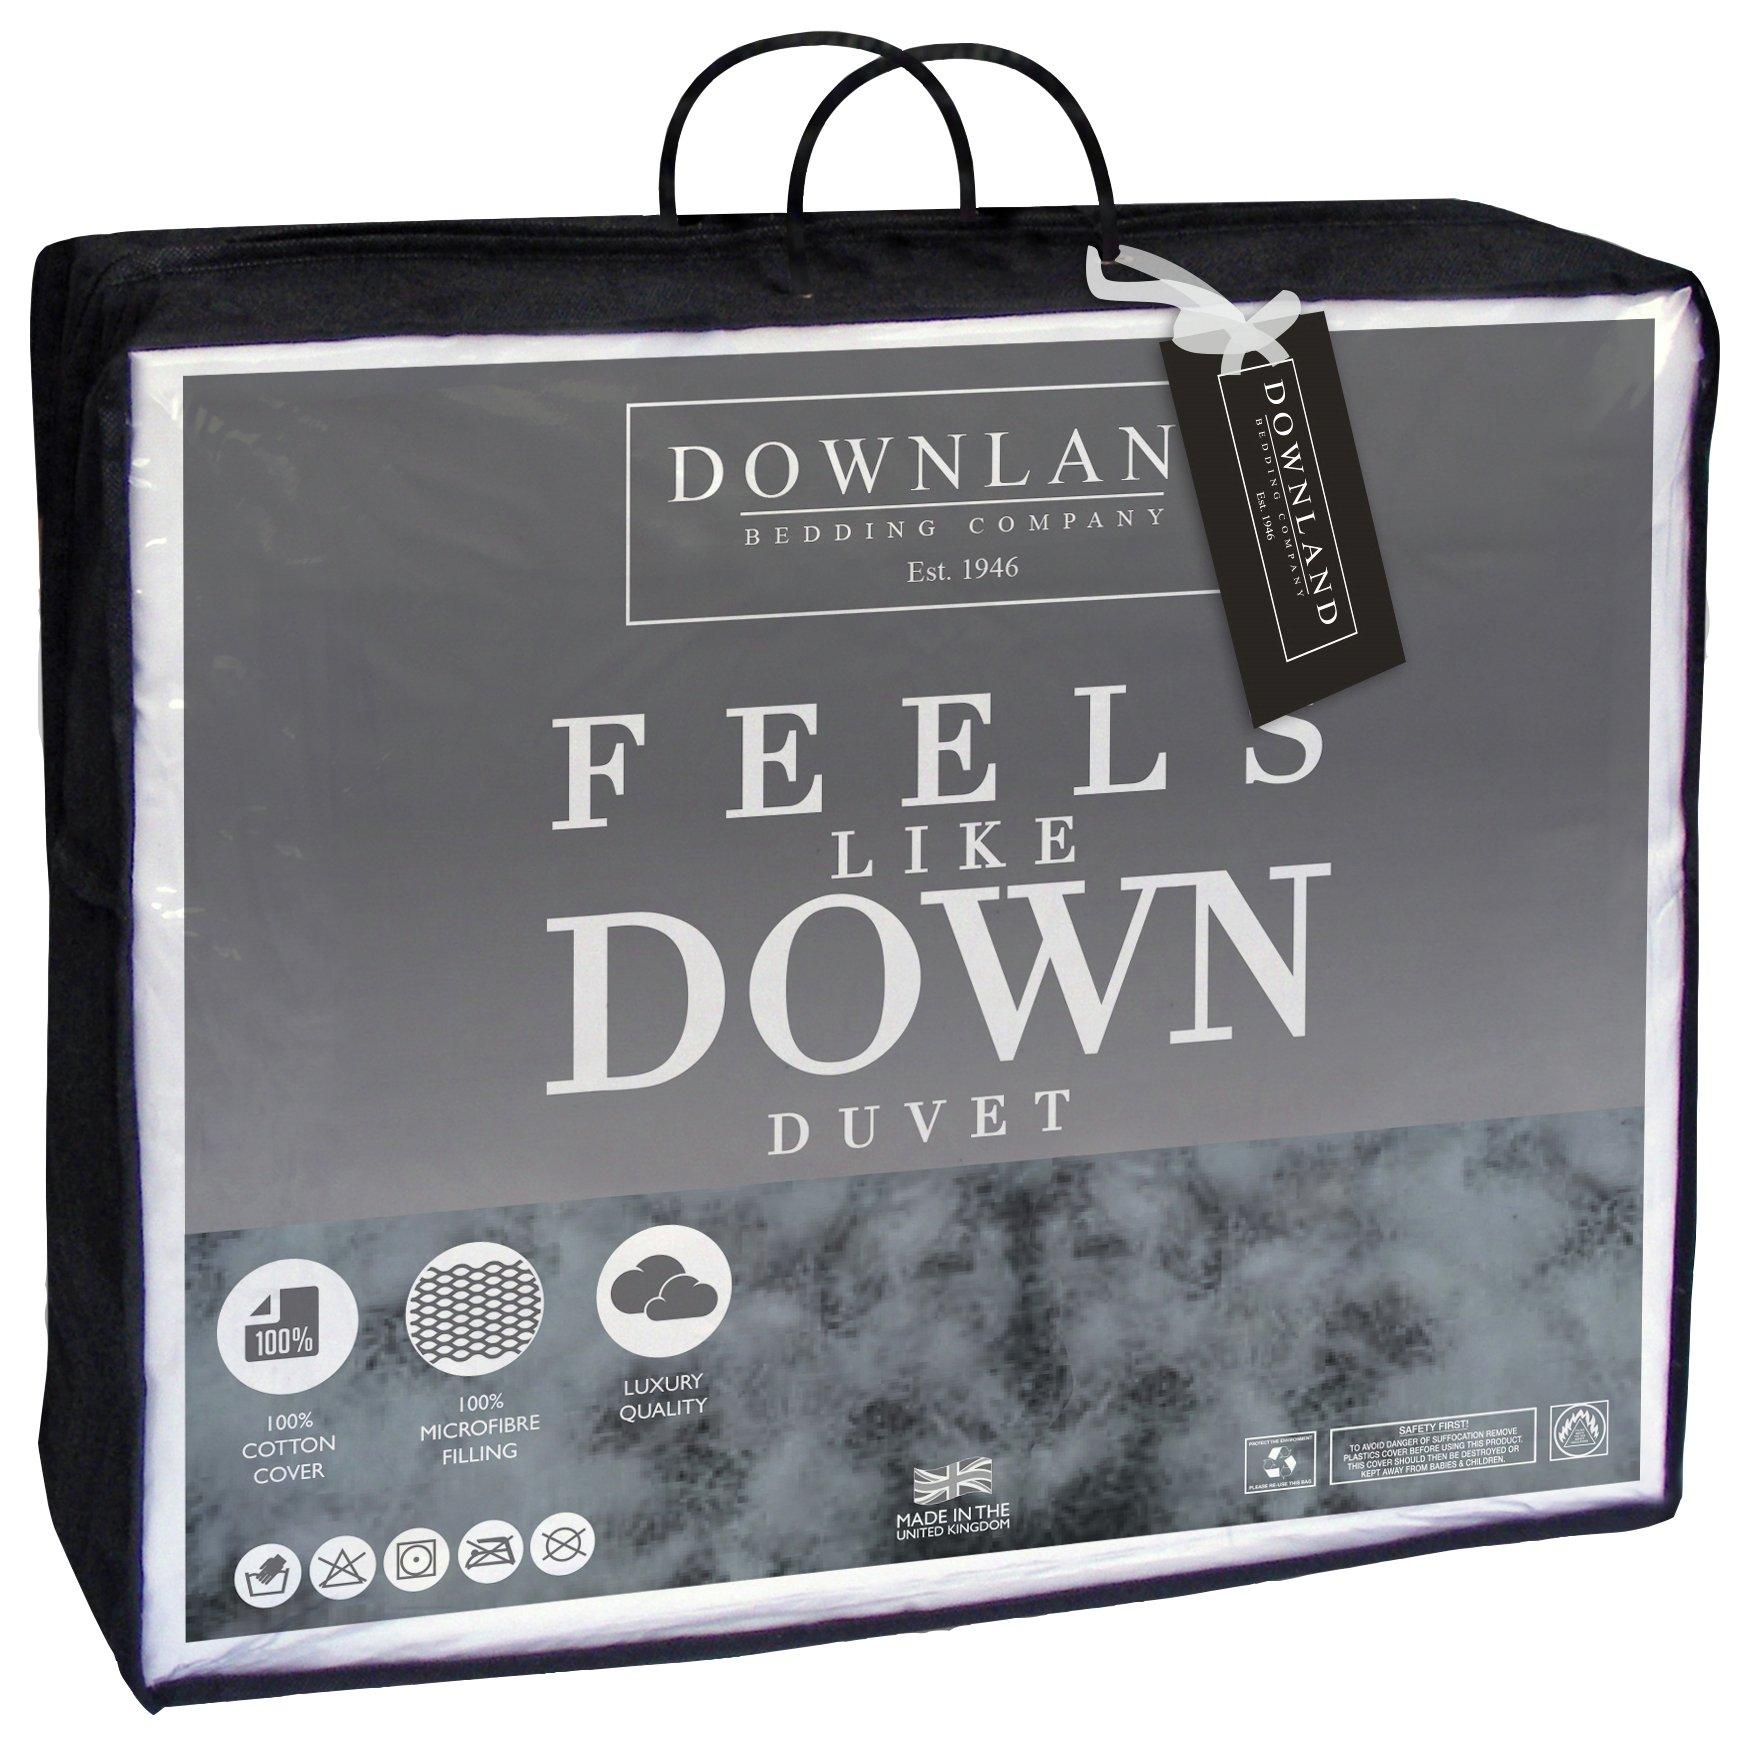 downland  feels like down 105 tog  duvet  double